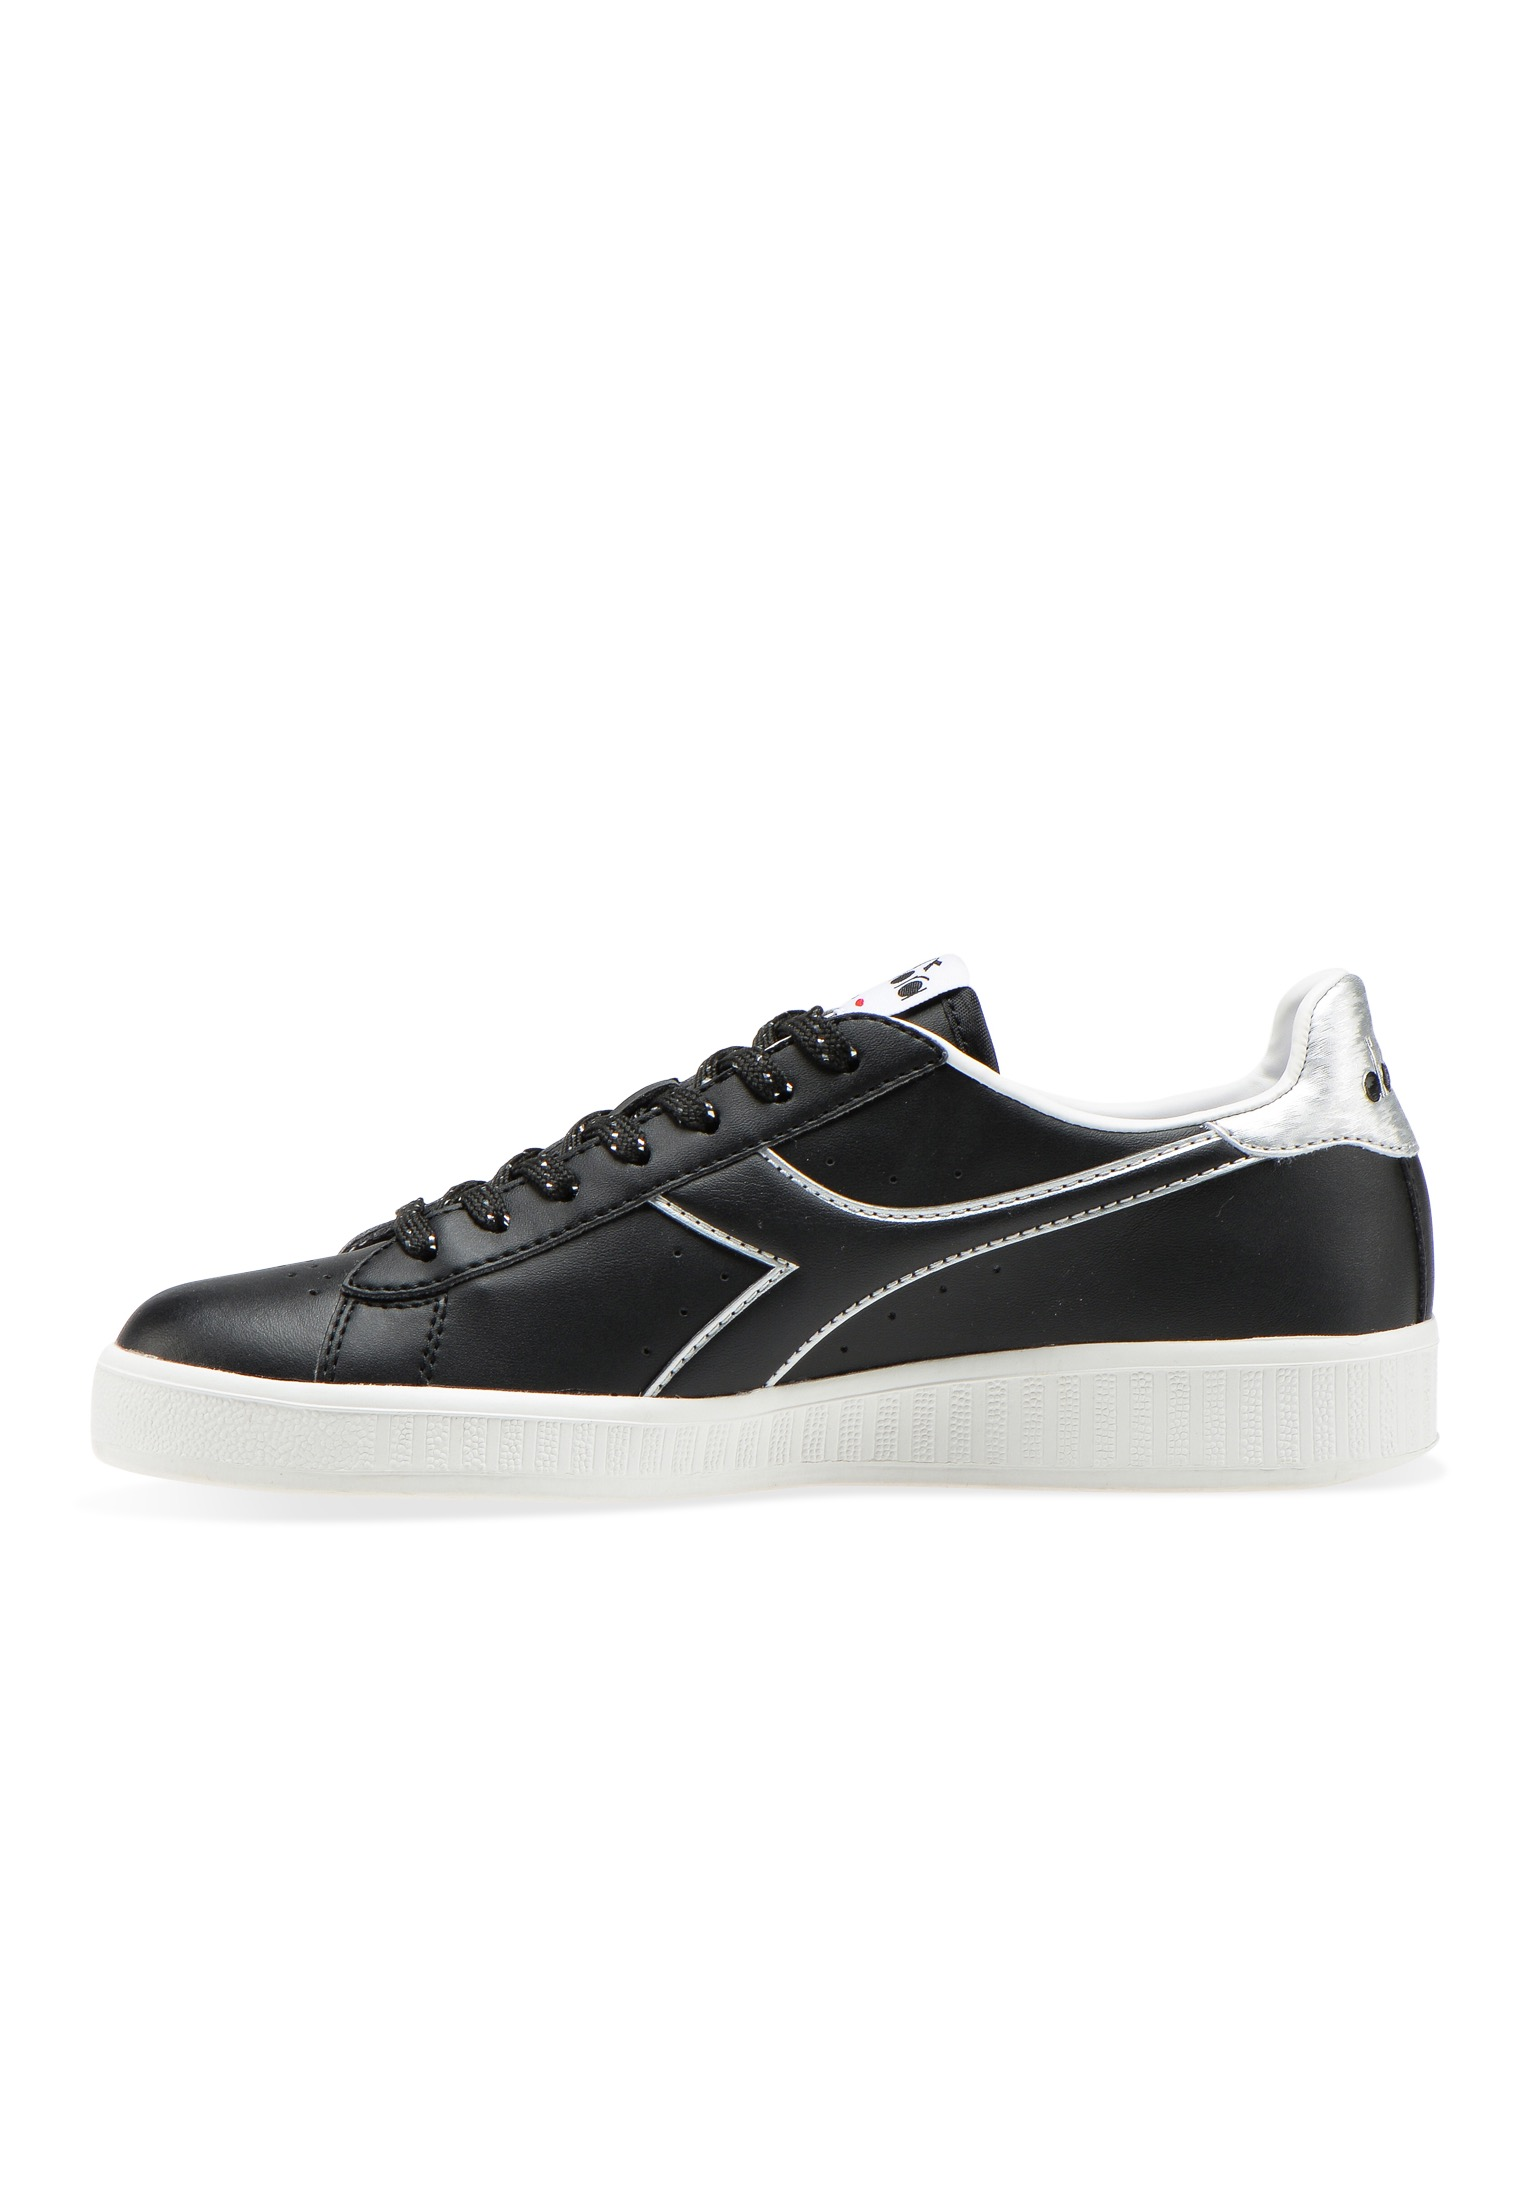 Diadora-Sneakers-GAME-P-WN-para-hombre-y-mujer miniatura 15